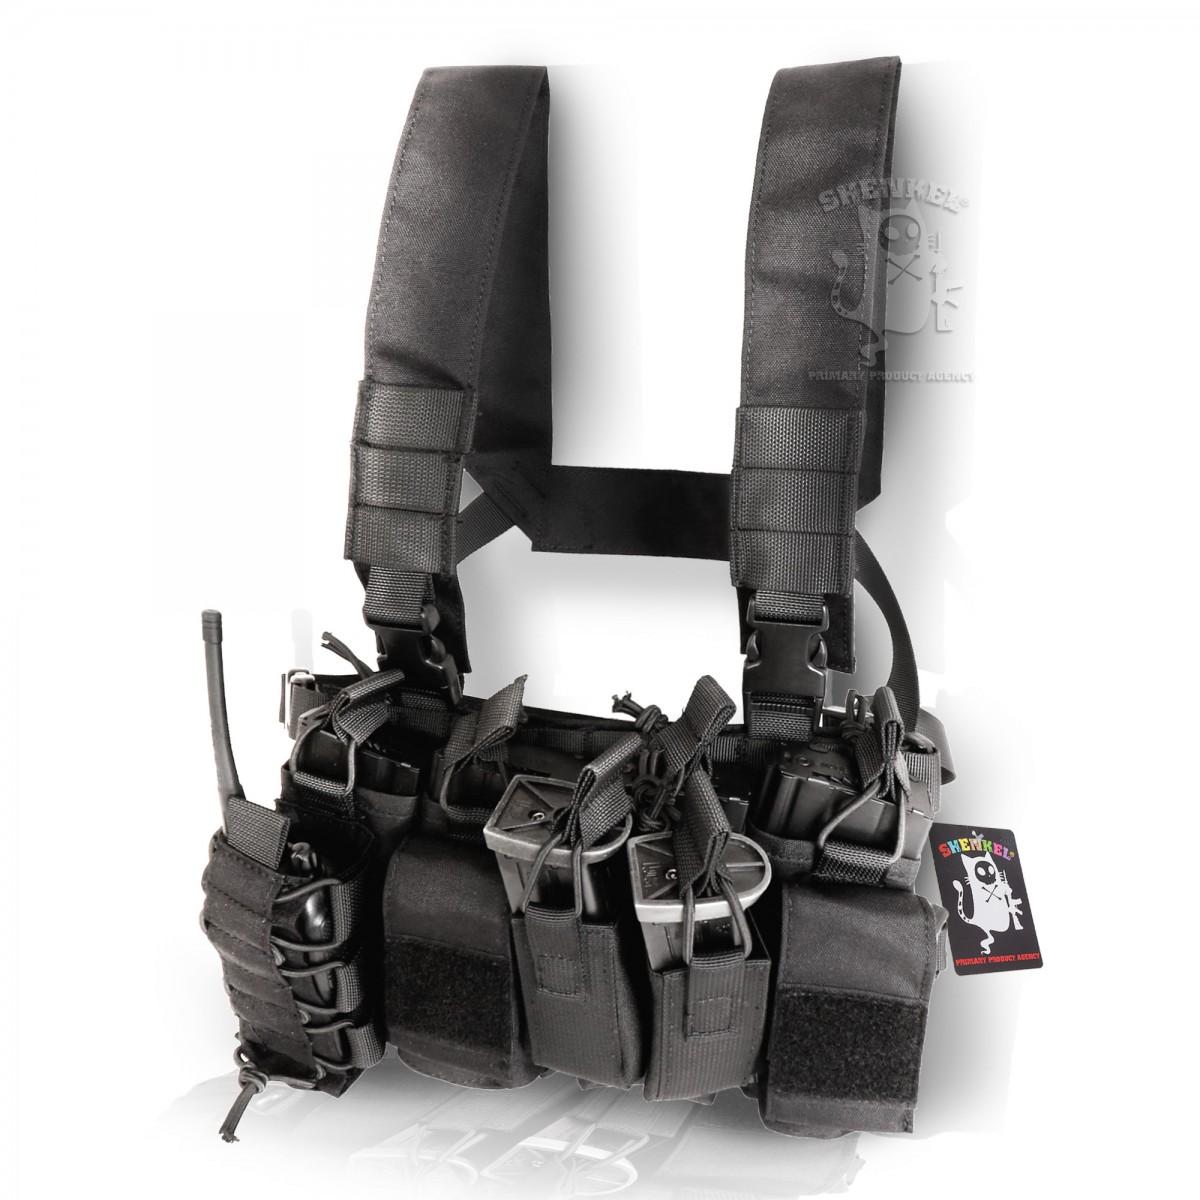 SHENKEL 軽量 コンパクト D-3タイプ チェストリグ ライトウェイト 3色( BK/MC/TAN  ) 軽装備 サバゲー サバイバルゲーム ベスト